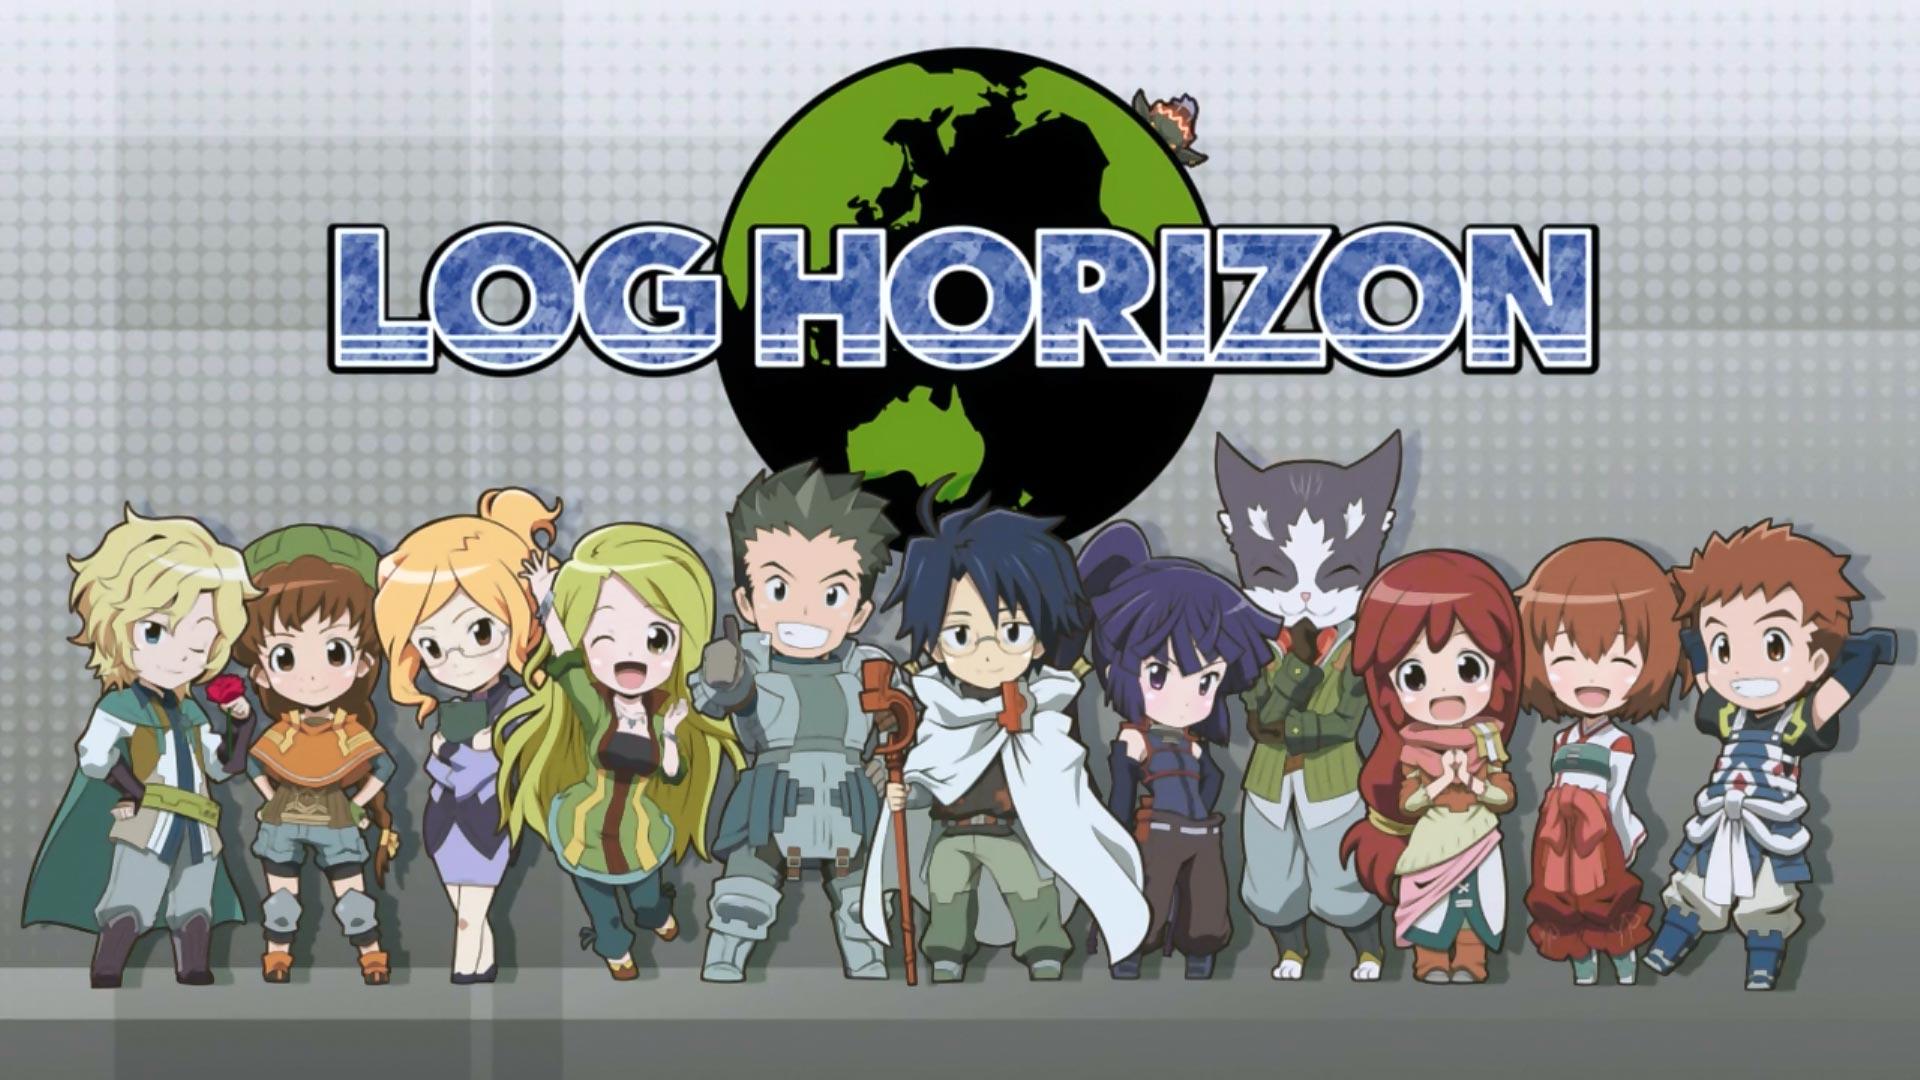 >Log horizon บันทึกเส้นขอบฟ้า ภาค 1 ตอนที่ 1-25 พากย์ไทย